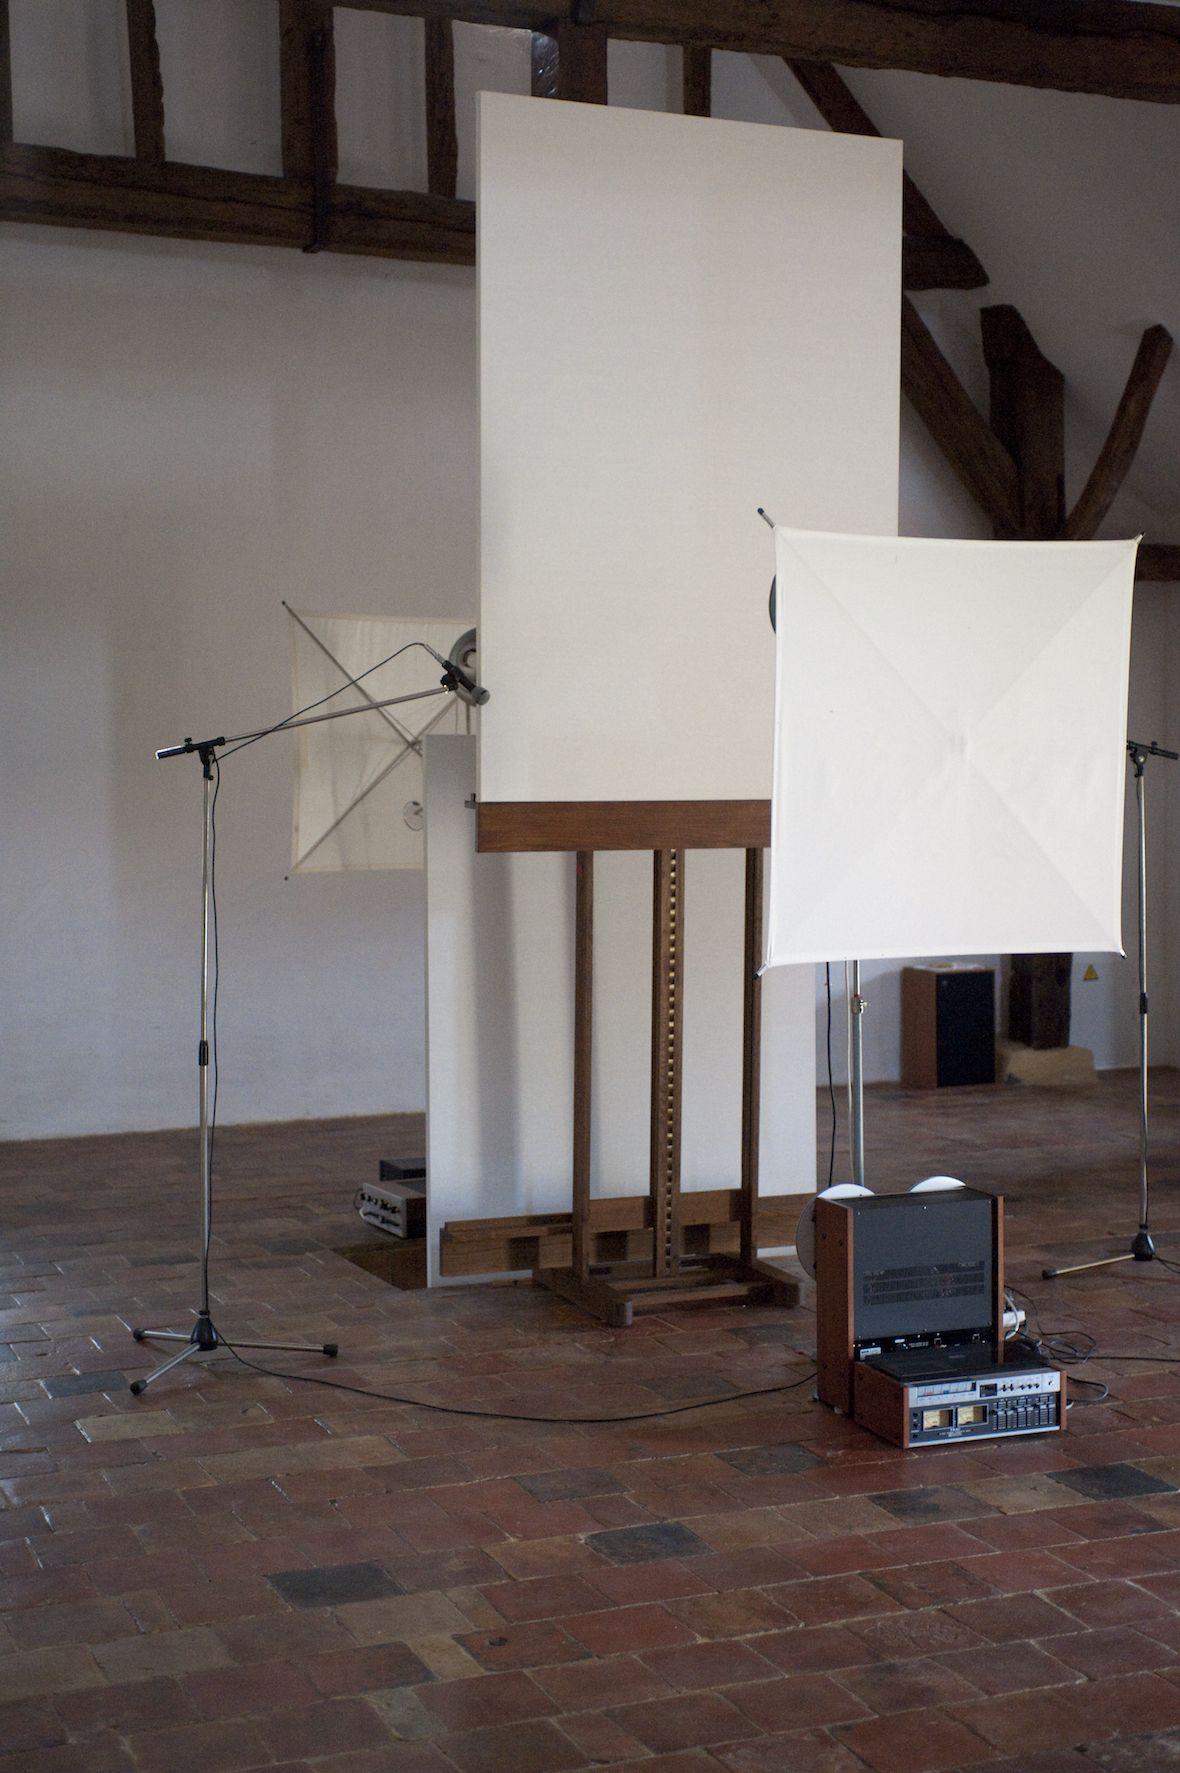 Roman Opalka, Studio images